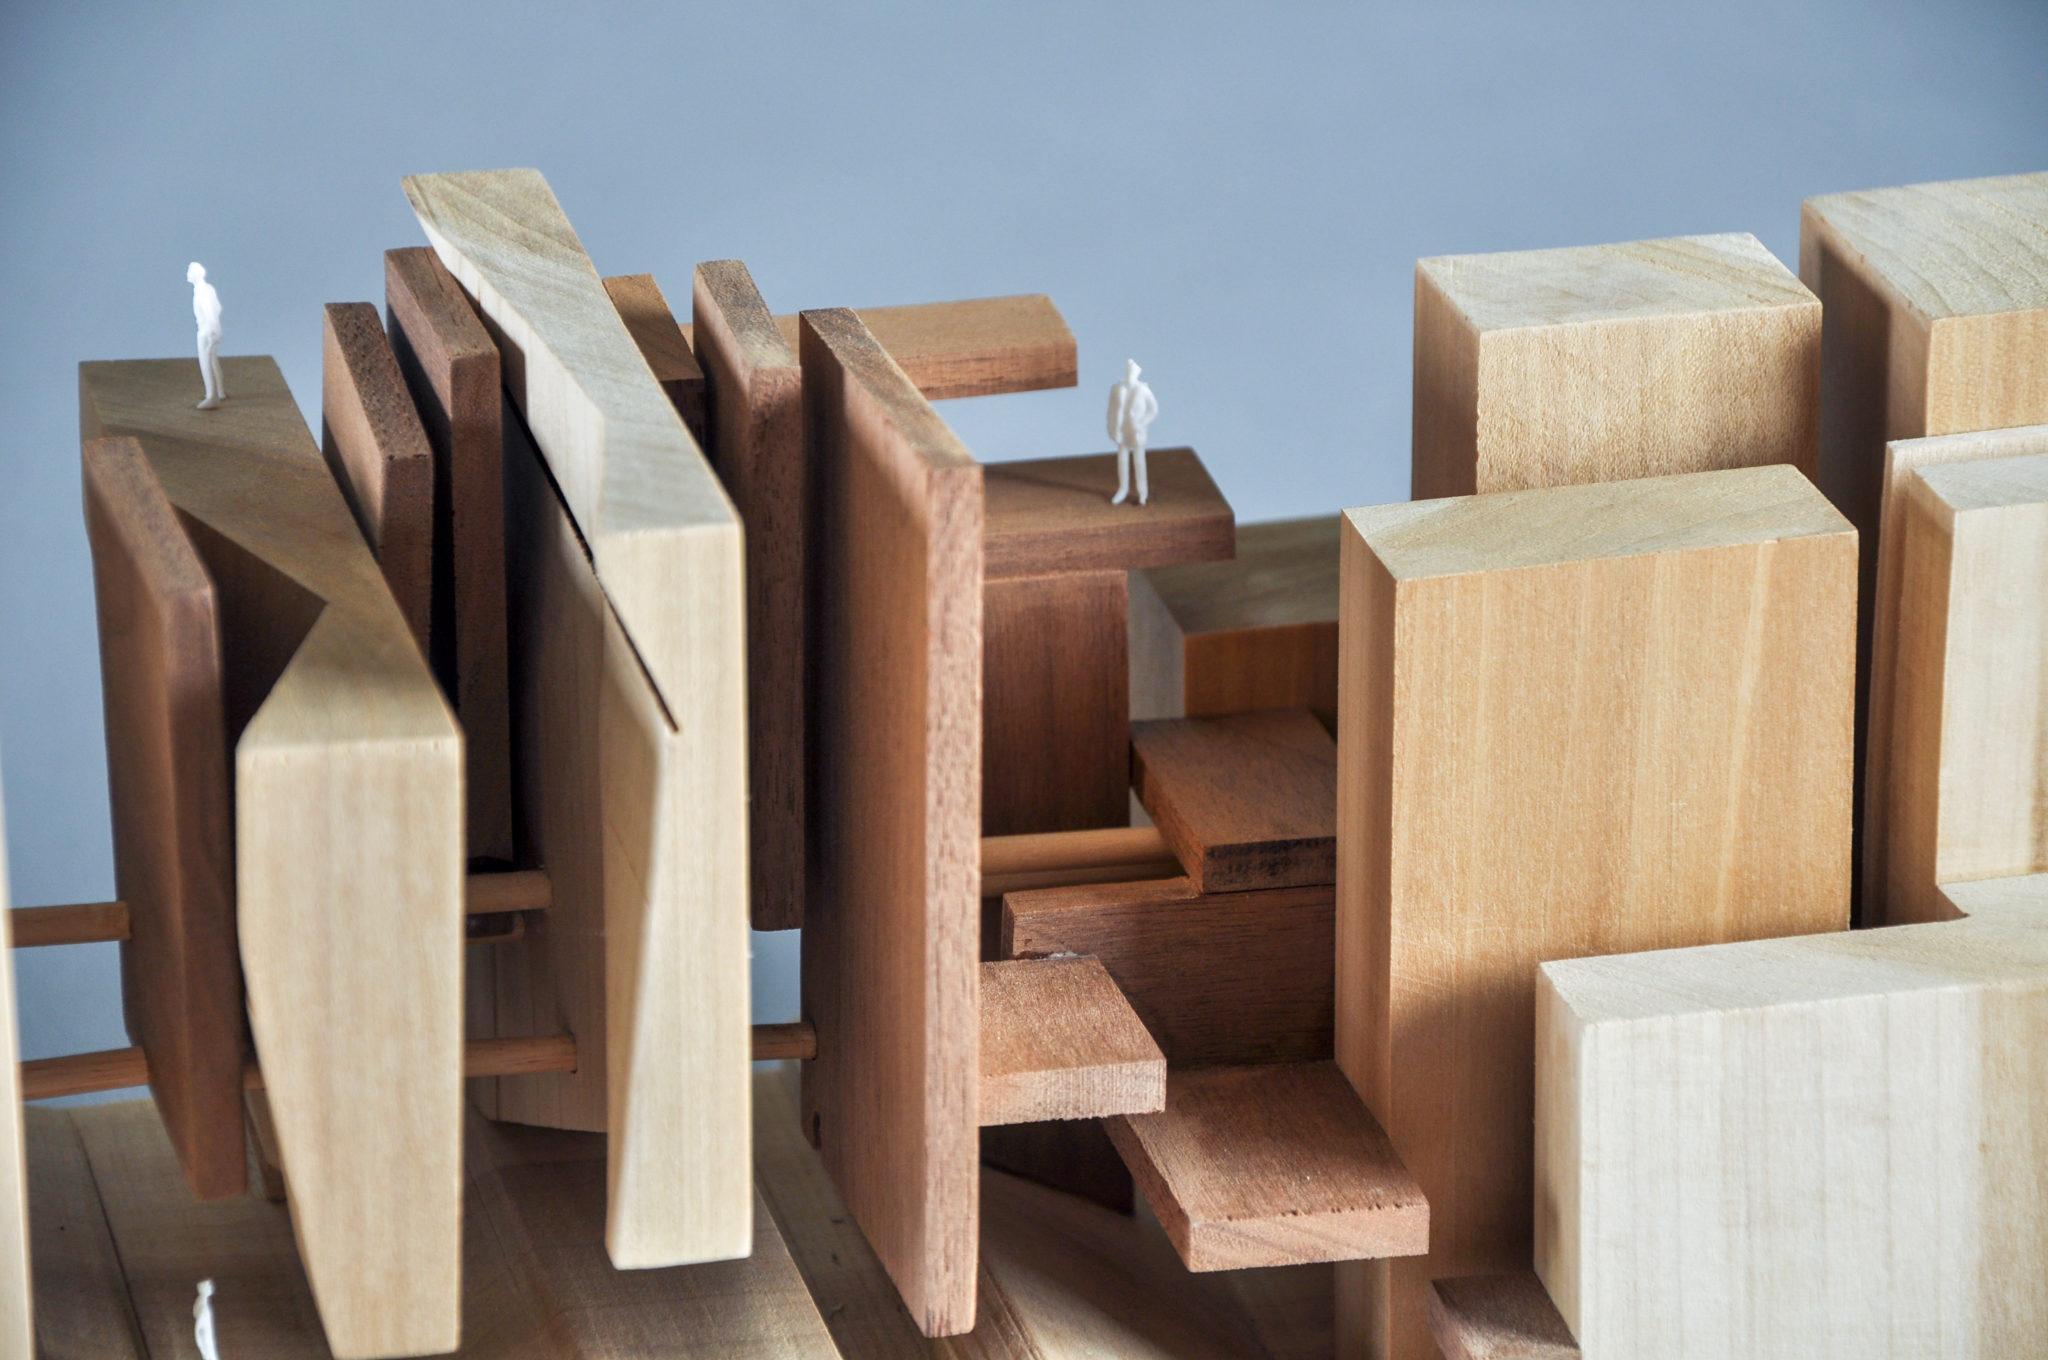 Architectural scale model by Meng Fan